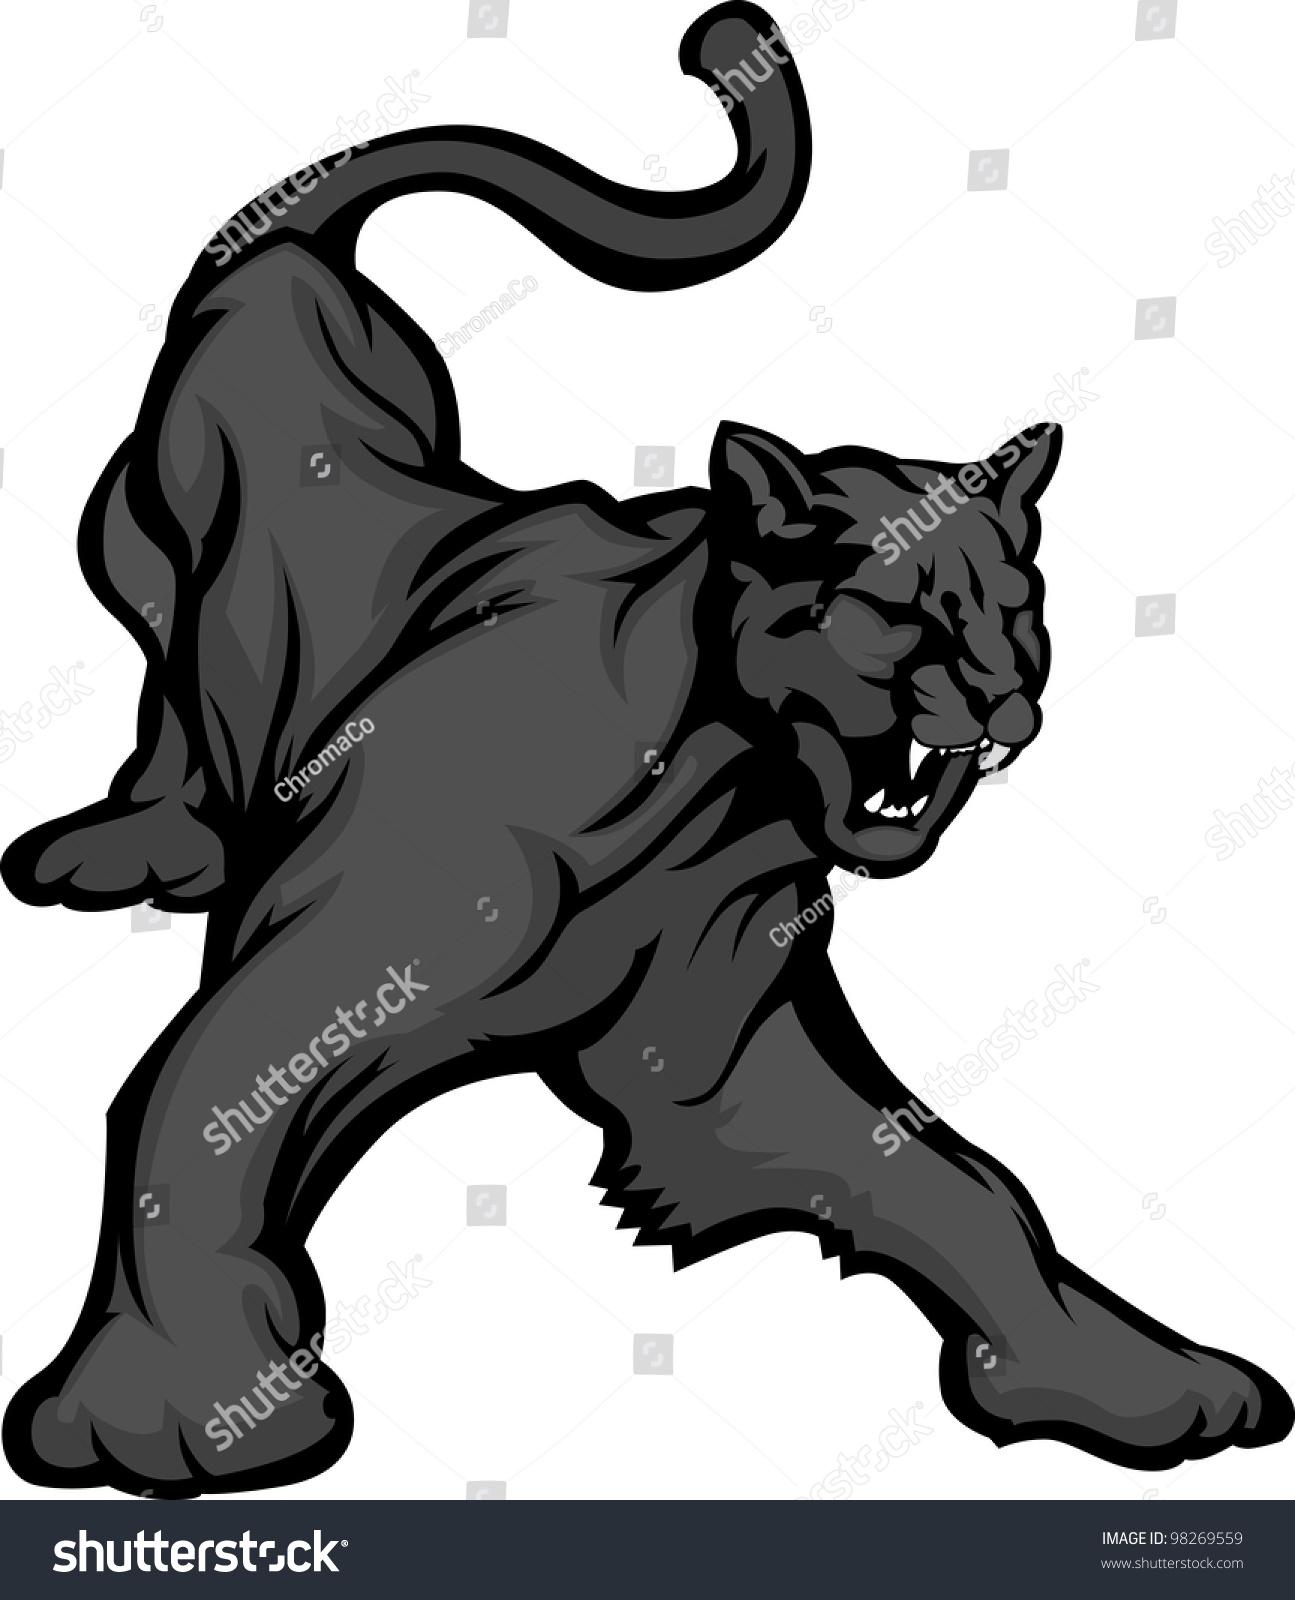 Black Jaguar Growl: Graphic Mascot Vector Image Black Panther Stock Vector